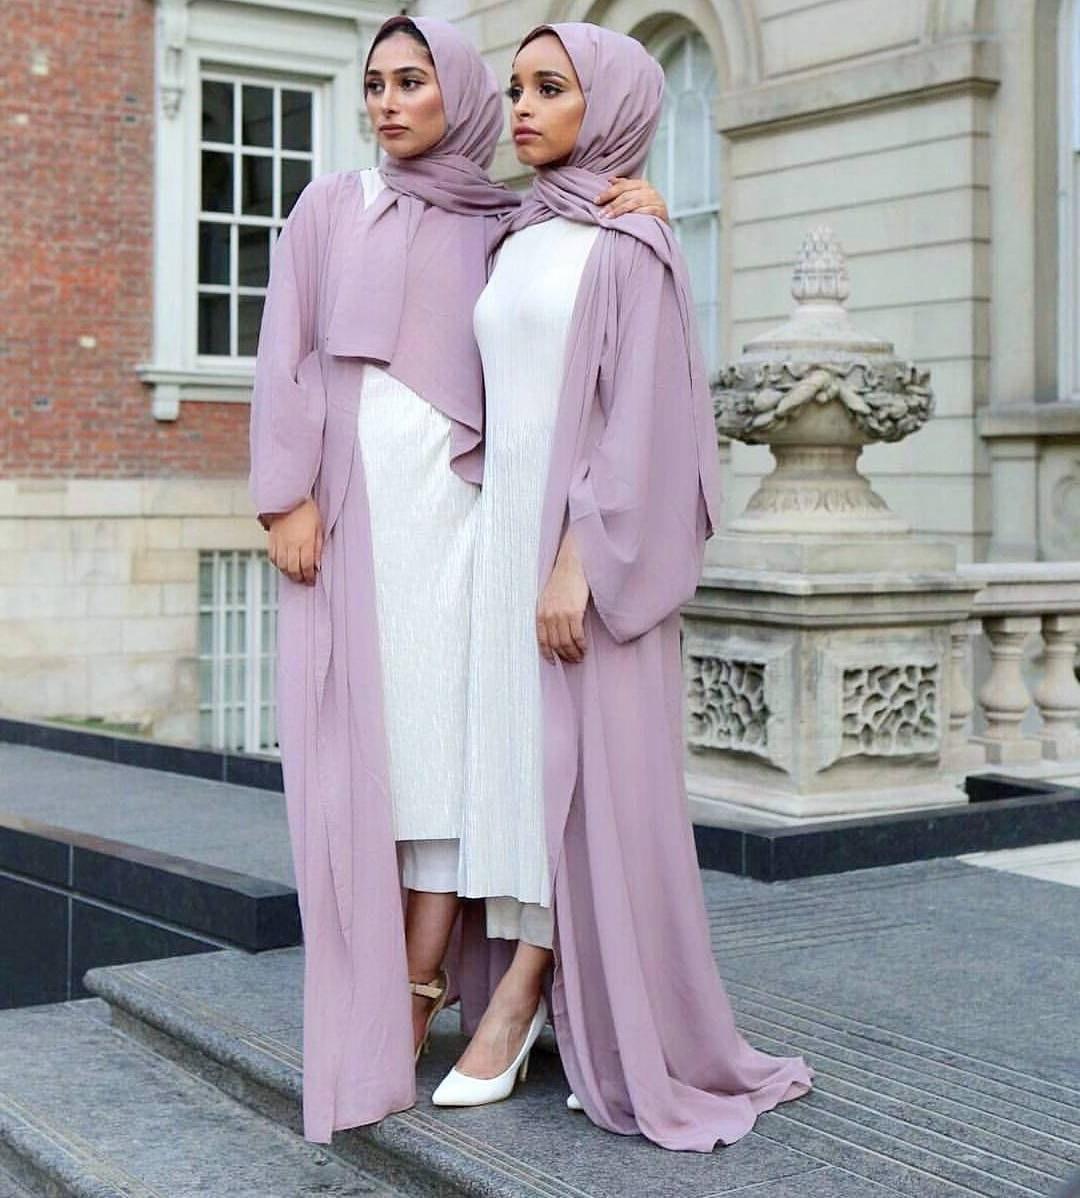 Design Baju Lebaran Tahun 2018 Ffdn 50 Model Baju Lebaran Terbaru 2018 Modern & Elegan